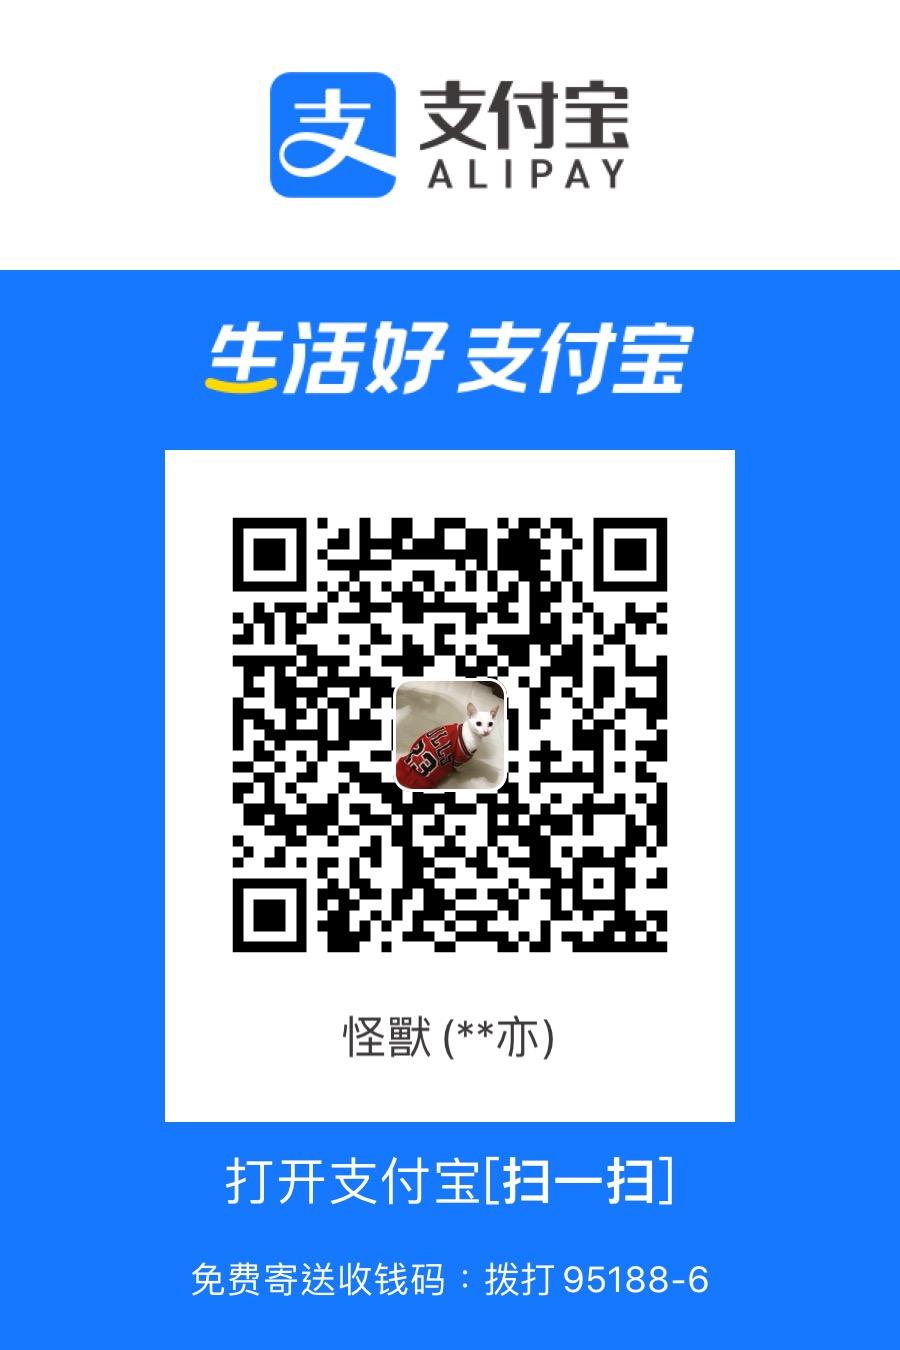 1an8r0wn Alipay